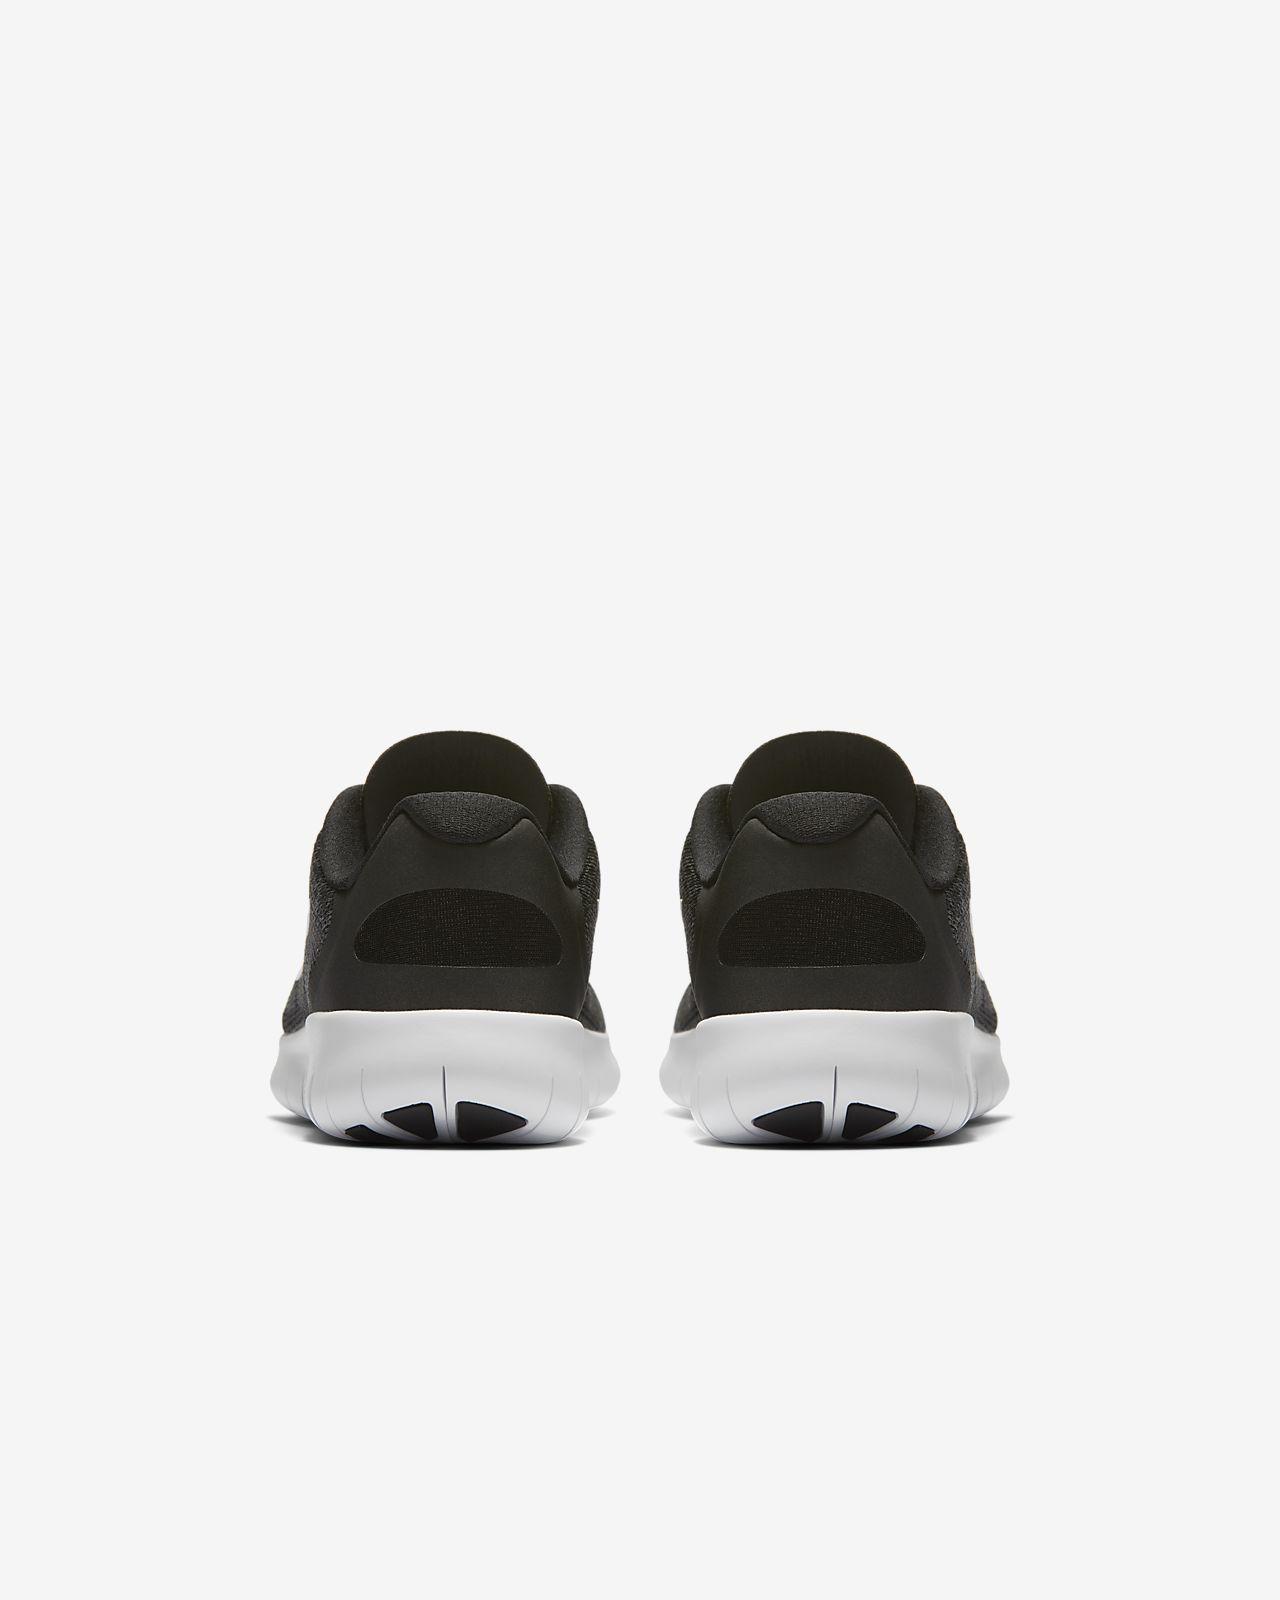 new product c2ba9 1c6d1 ... Löparsko Nike Free RN 2017 för ungdom